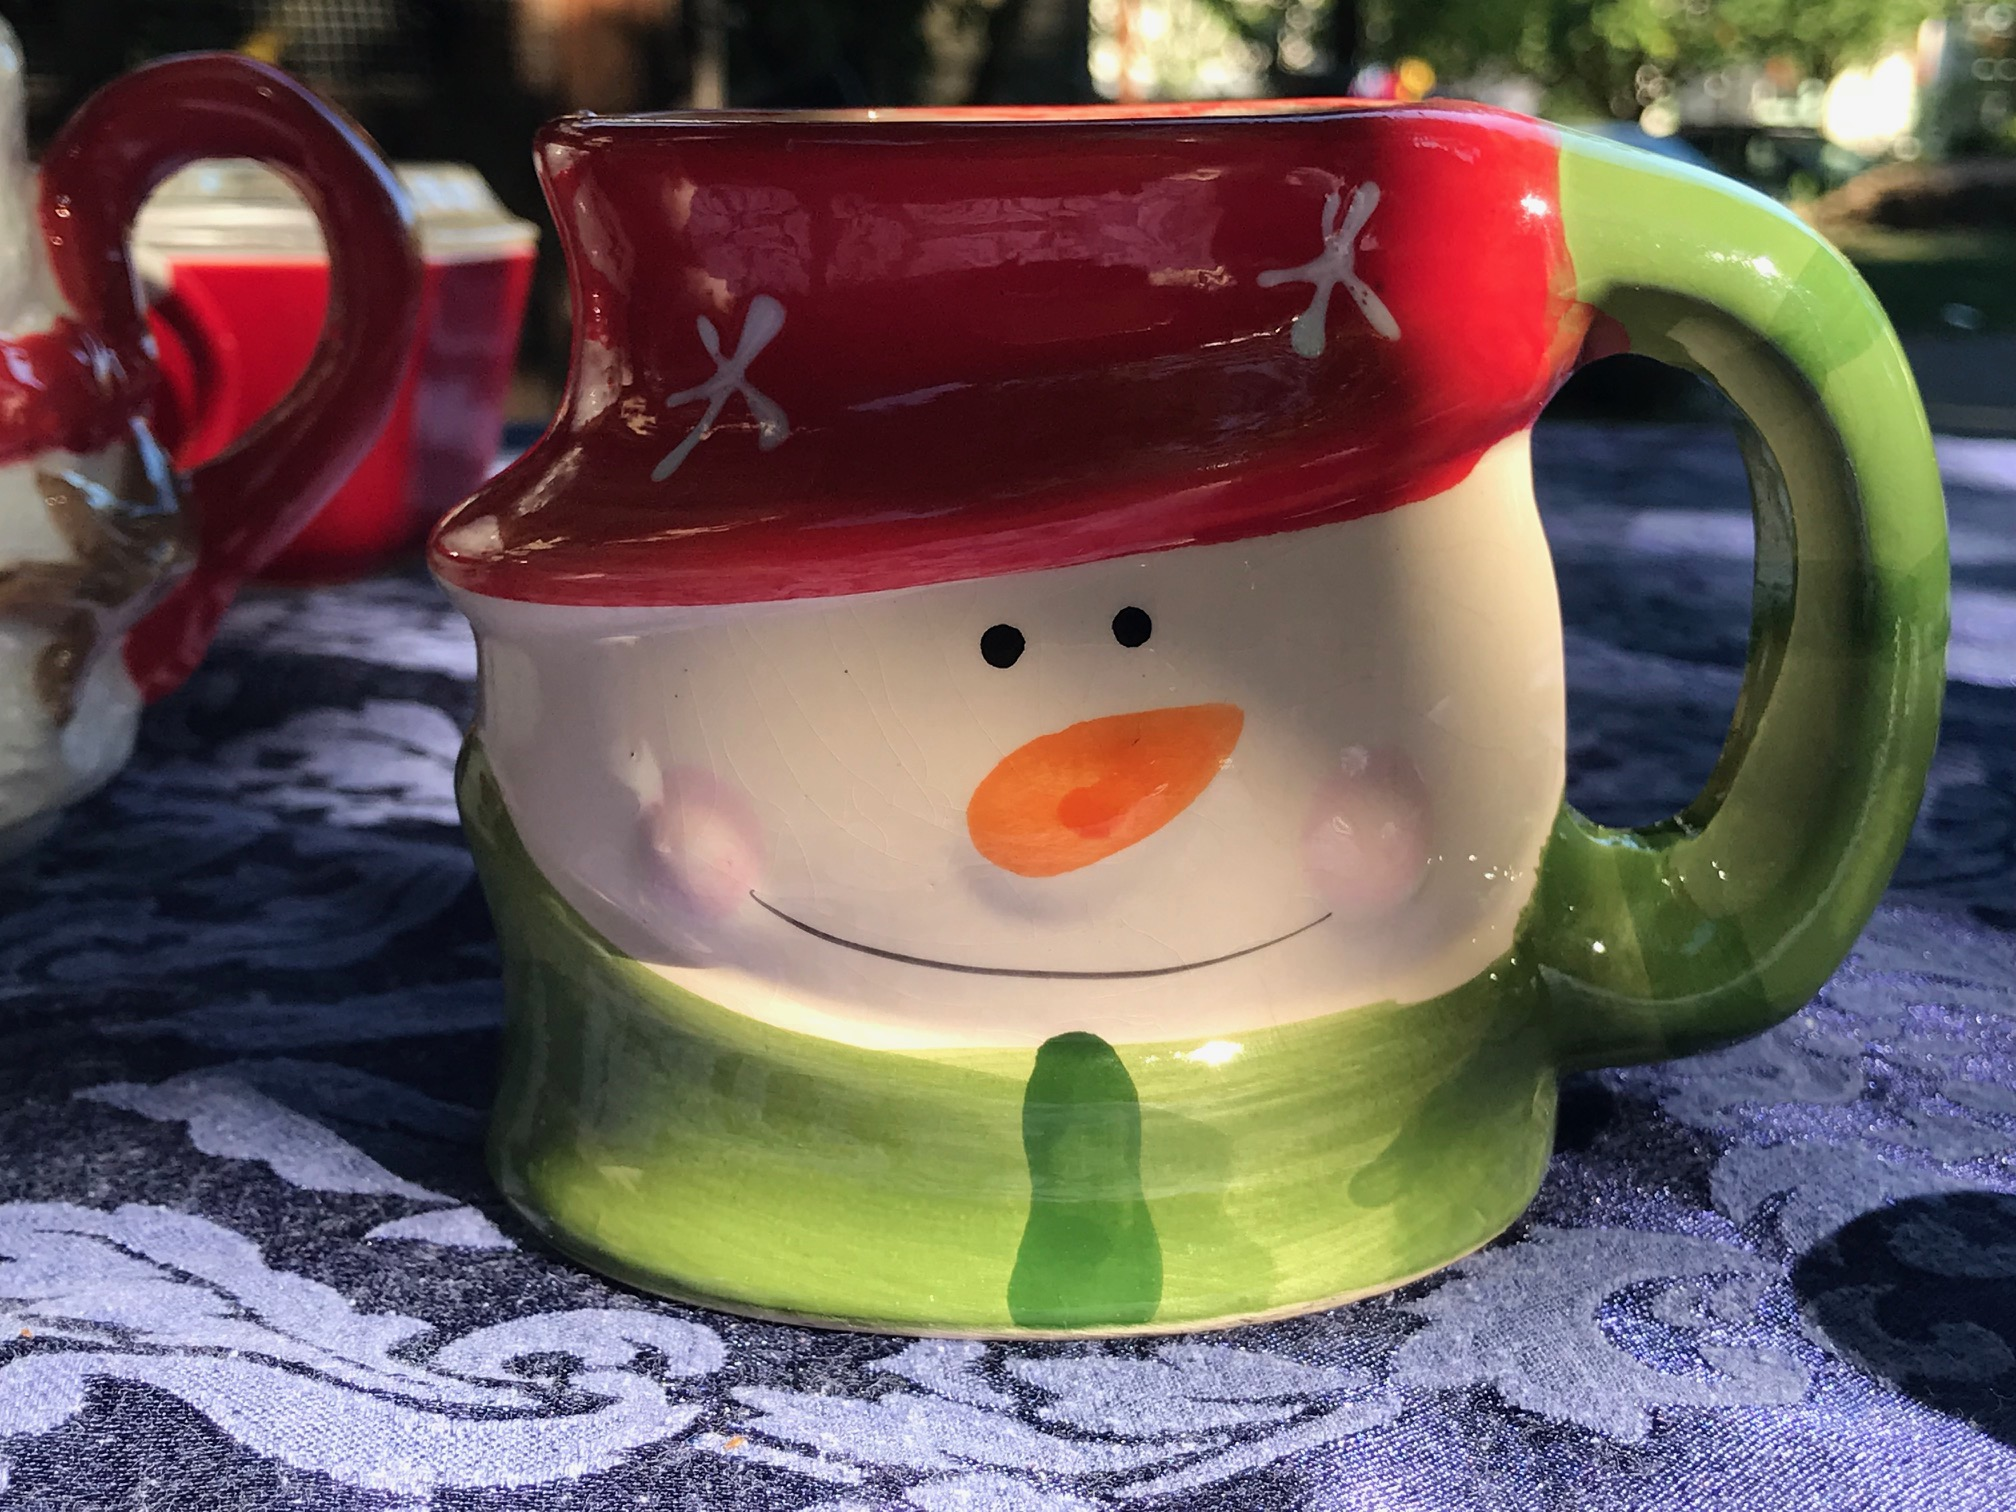 Ceramic Snowman Royal Lead539 Ppm Christmas Norfolk Mug1007 O0vmN8nw